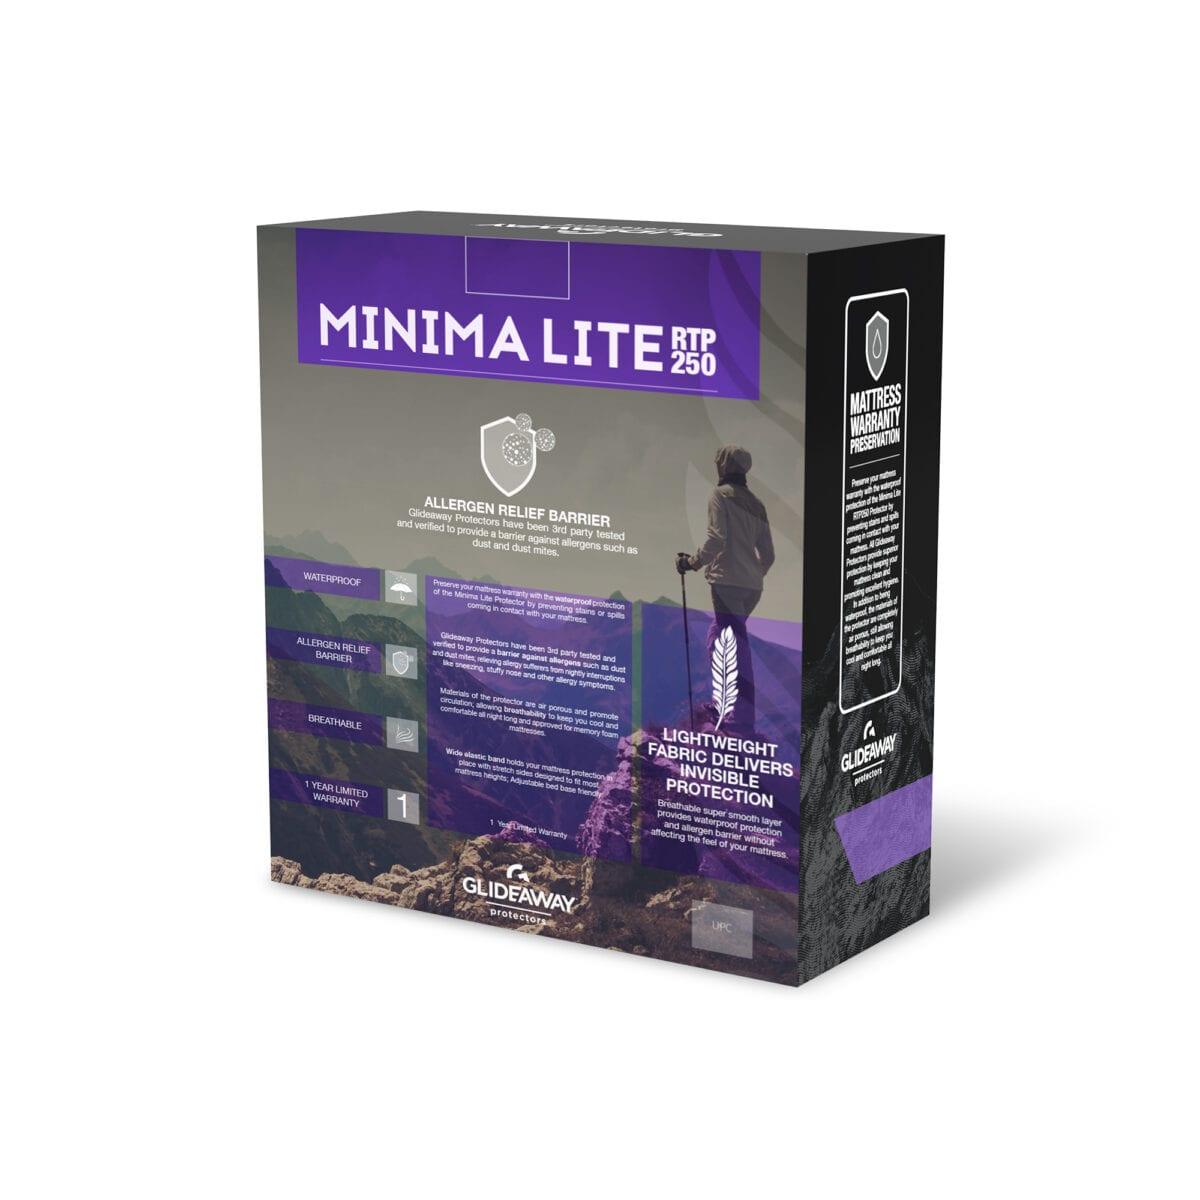 Minima Lite Mattress Protector